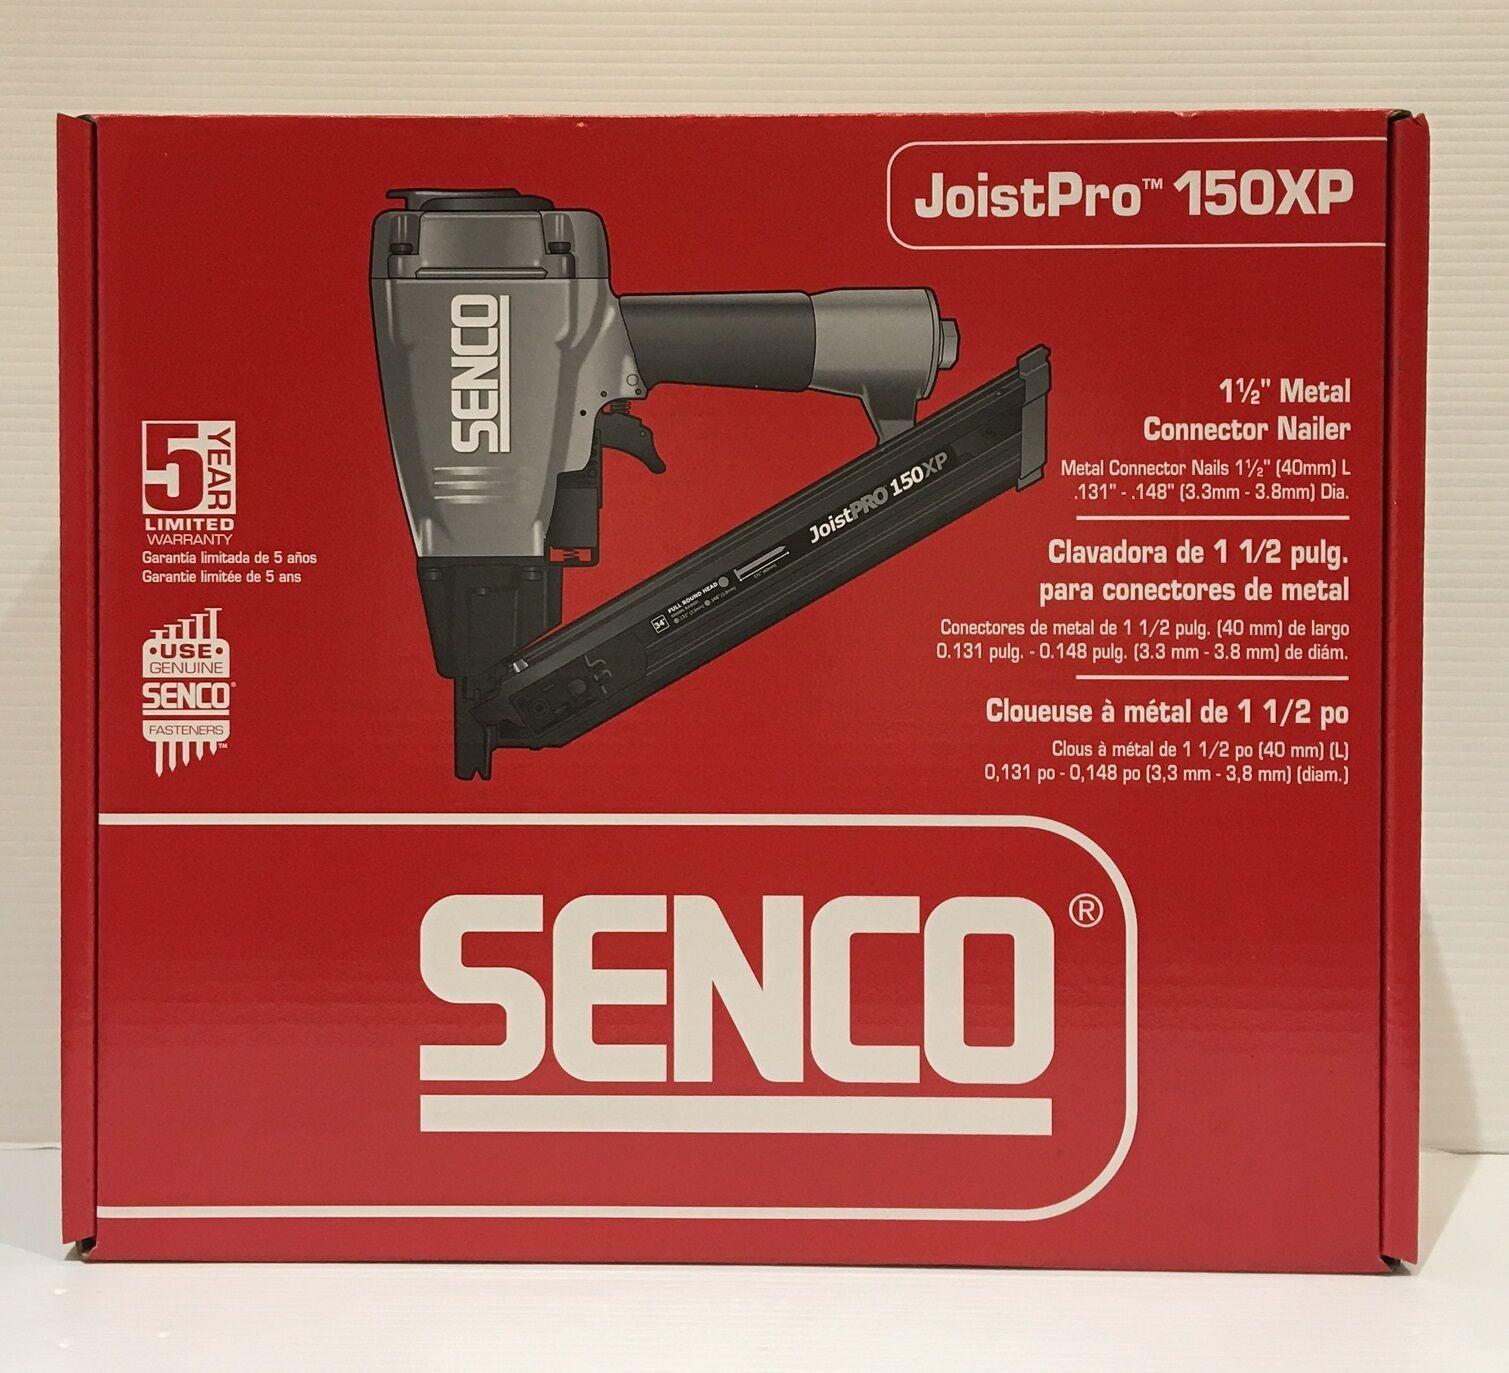 Senco 7L0001N JoistPro 150XP 1-1 2  Metal Connector Nailer, New Retail